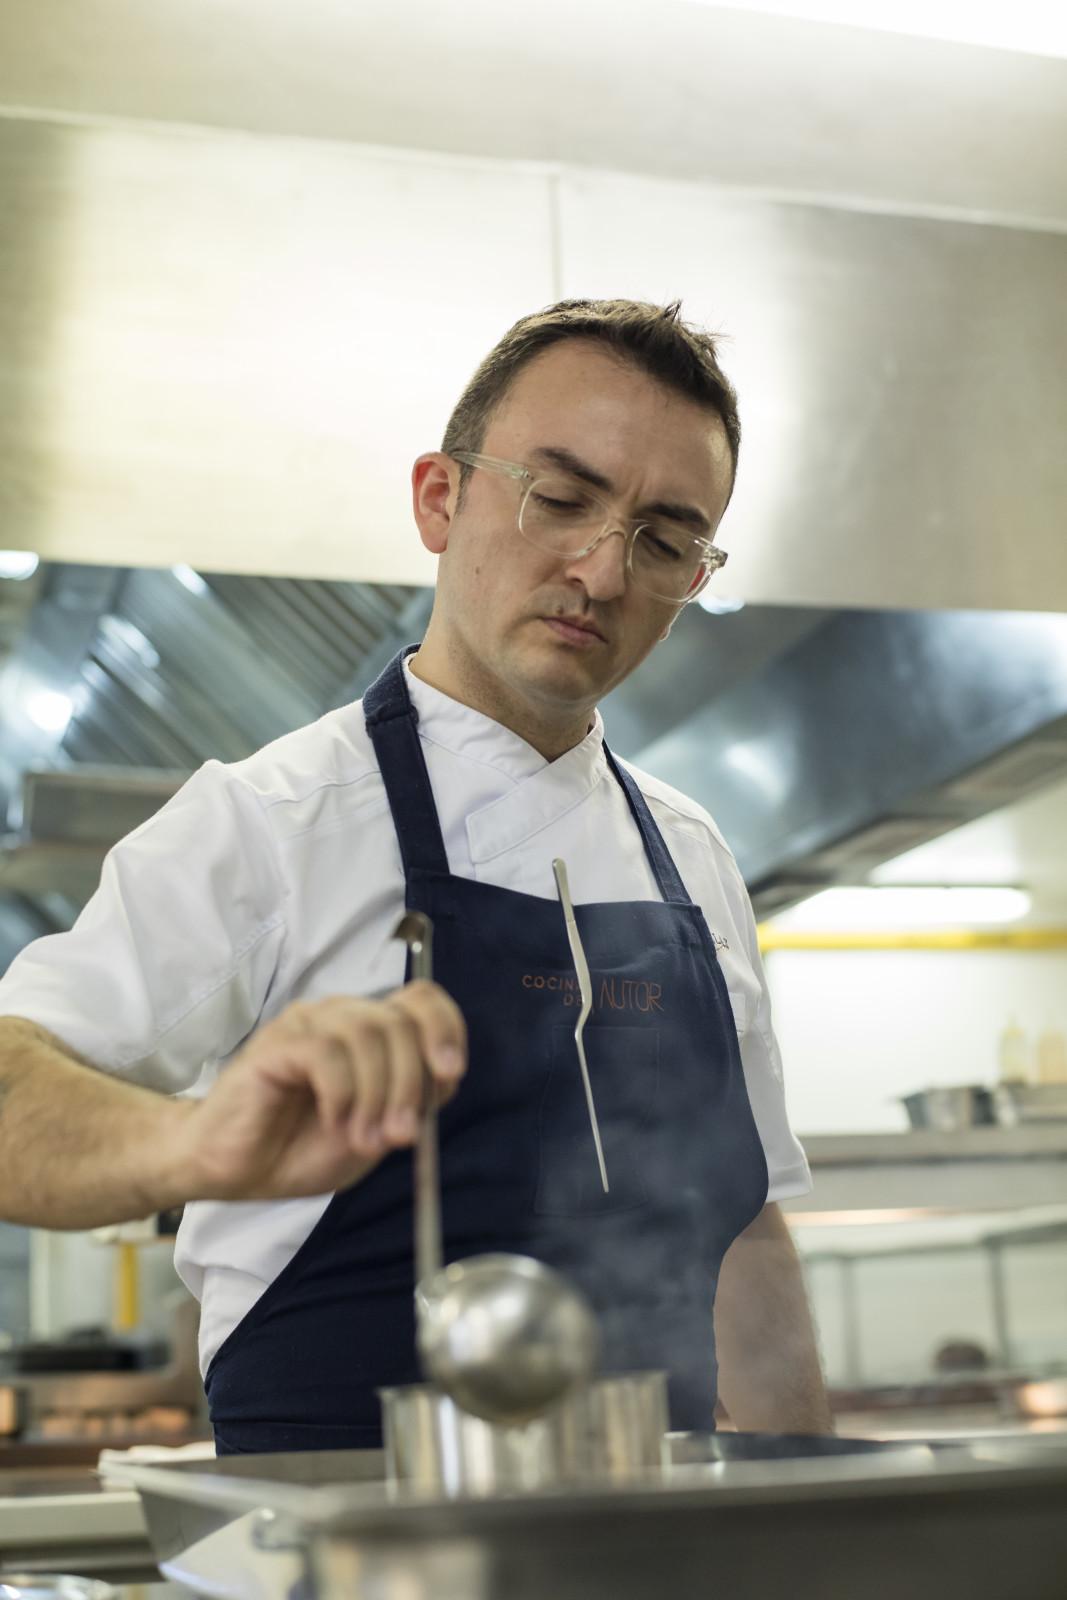 cocina-de-autor-naum-chef,xlarge.1583769894